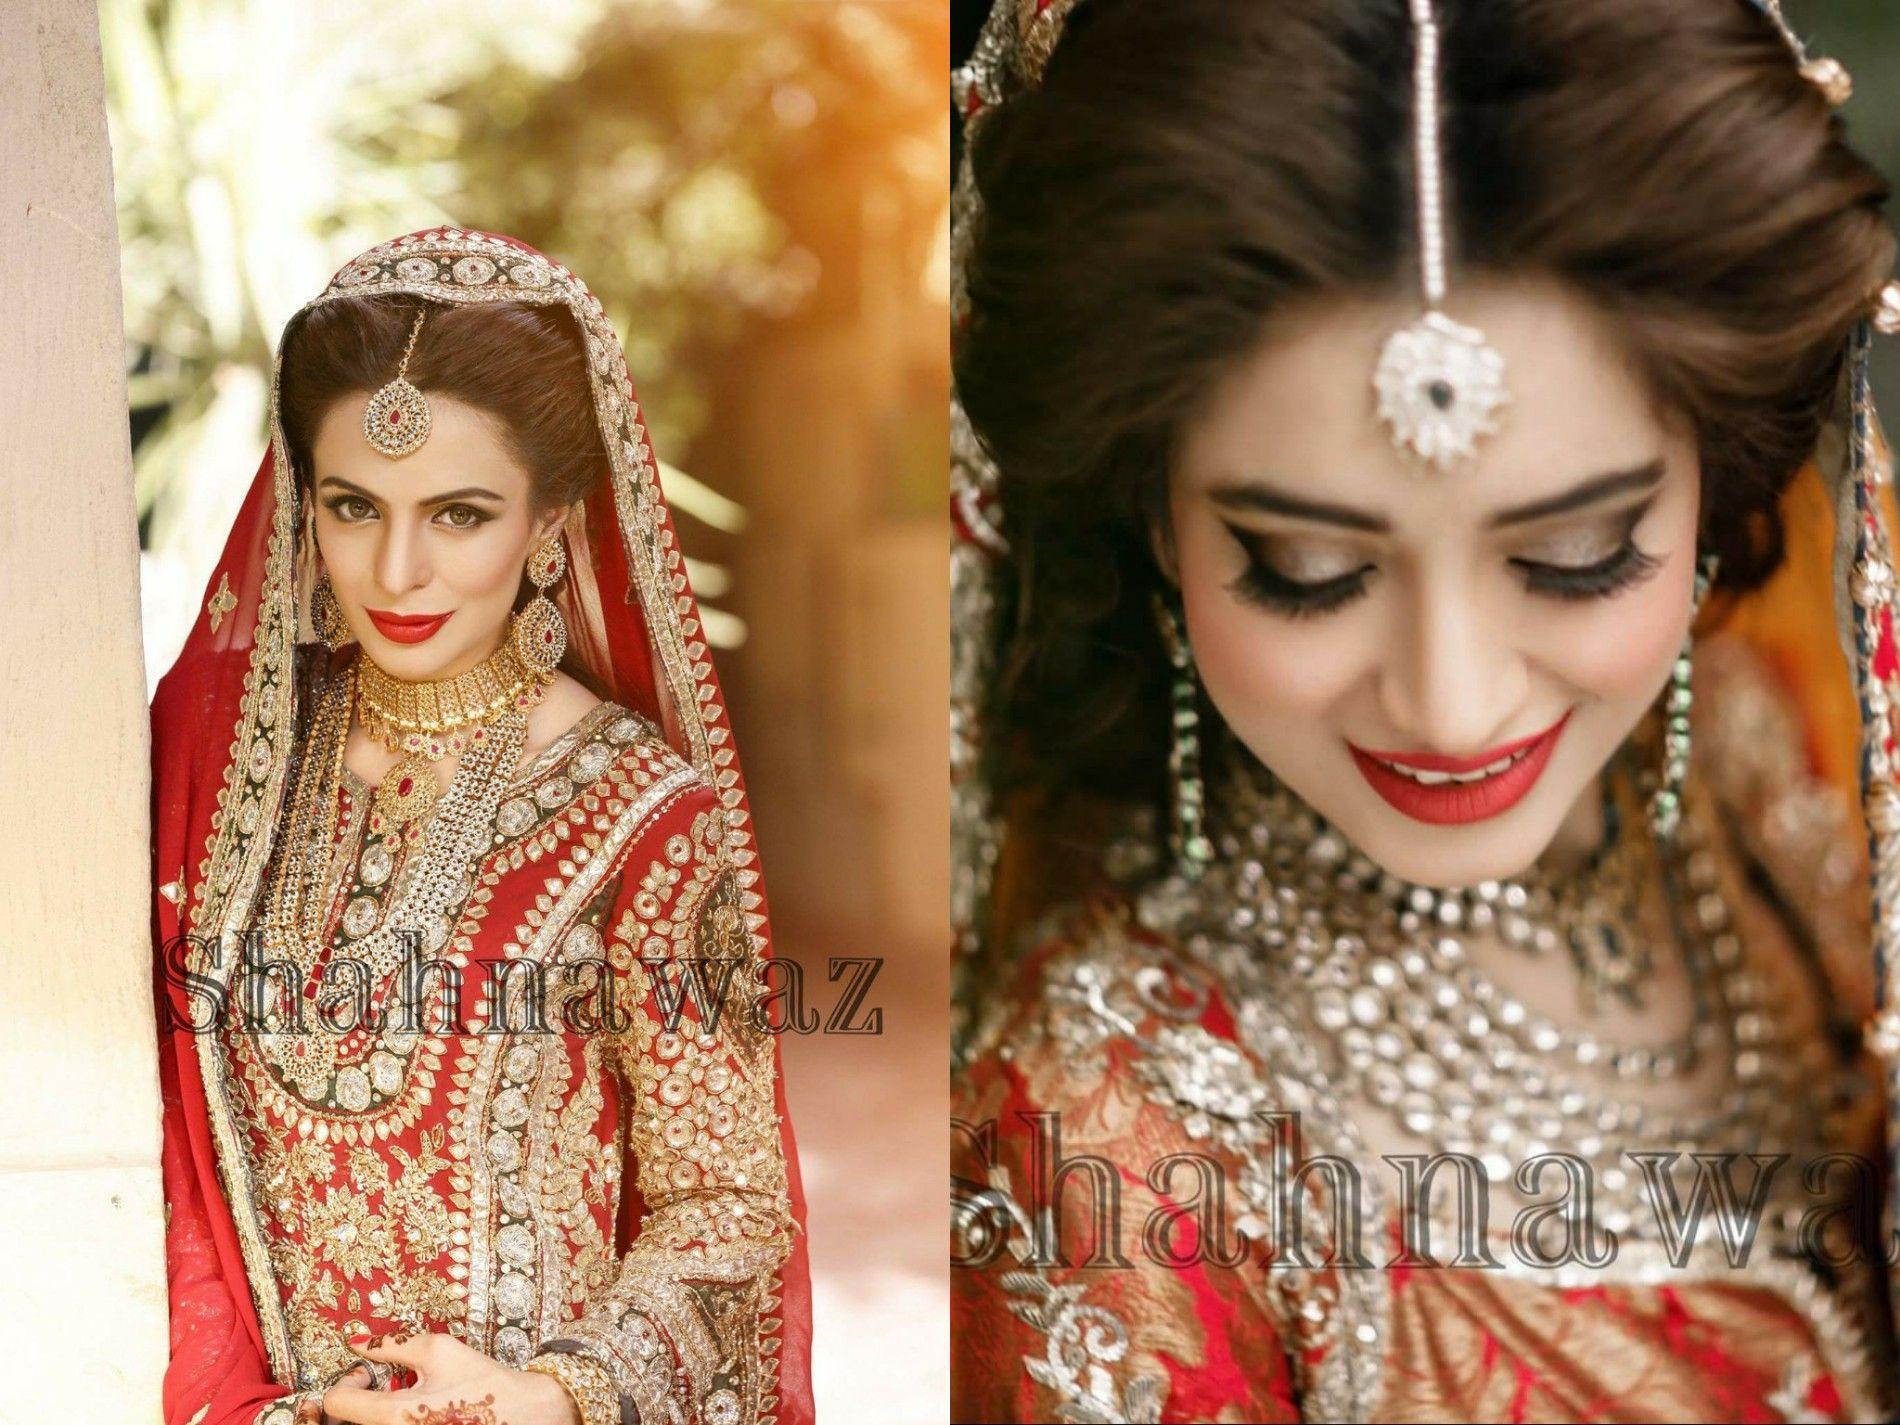 35370a9396 Shahnawaz studio photography | Wedding photography of Barat brides ...